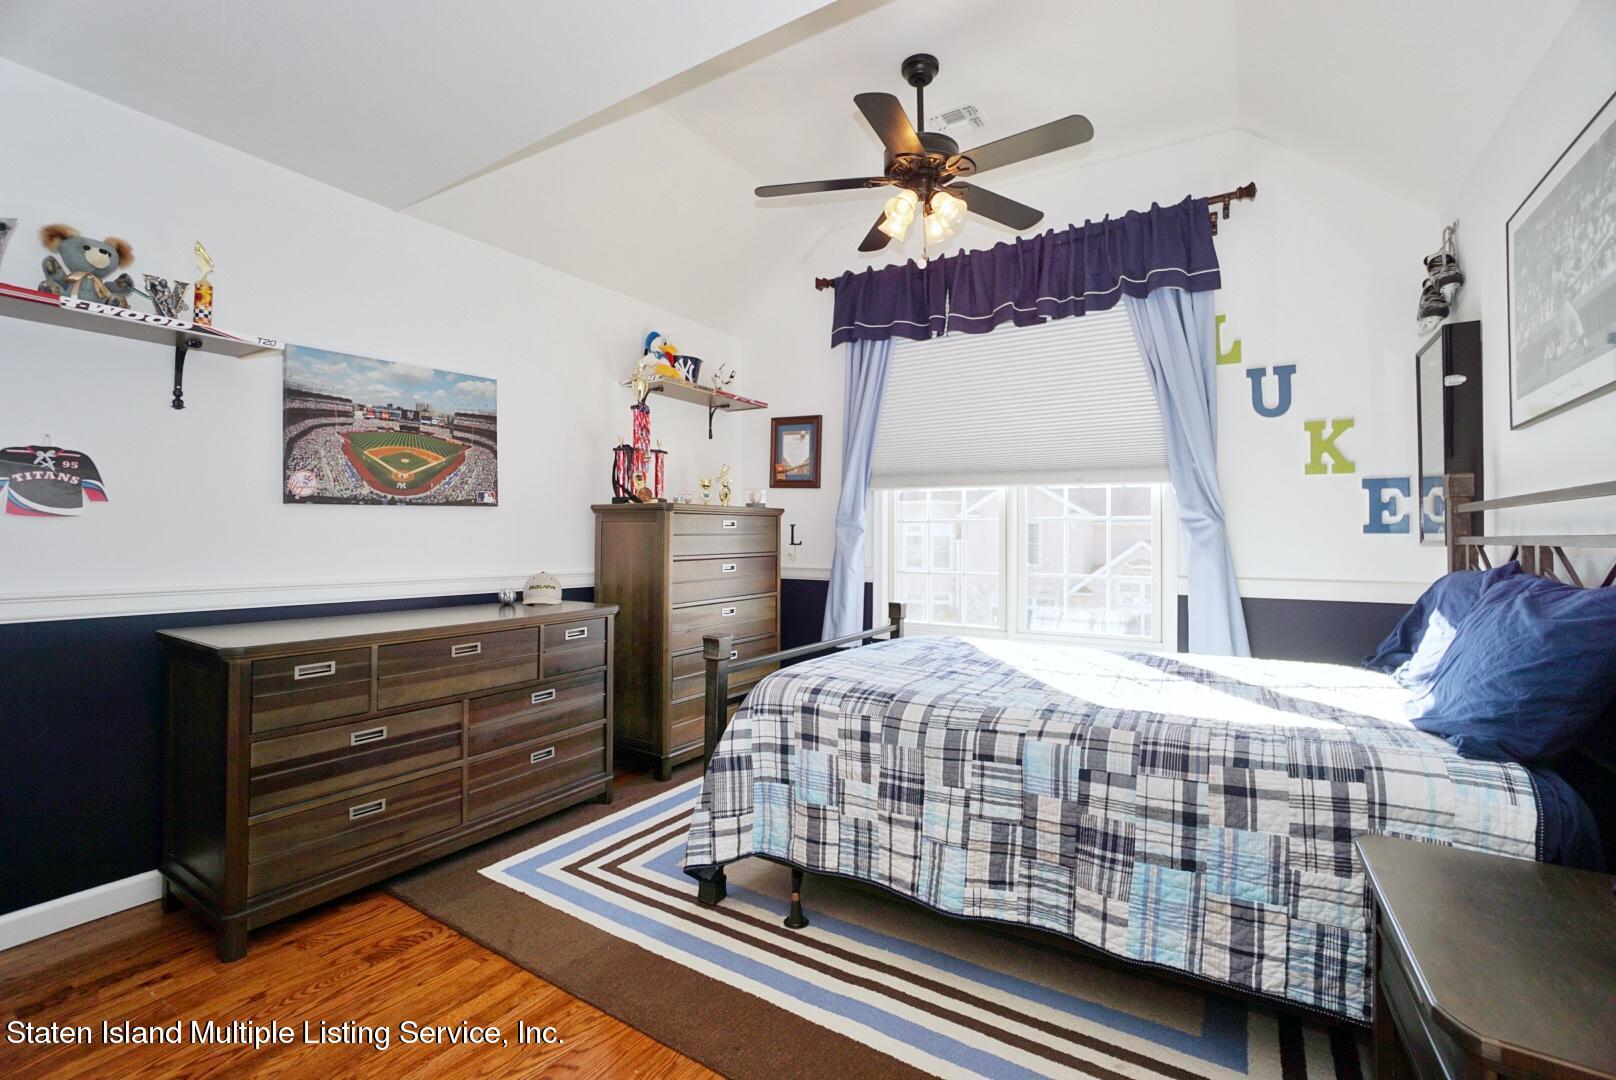 Single Family - Detached 31 Belwood Loop  Staten Island, NY 10307, MLS-1143133-37